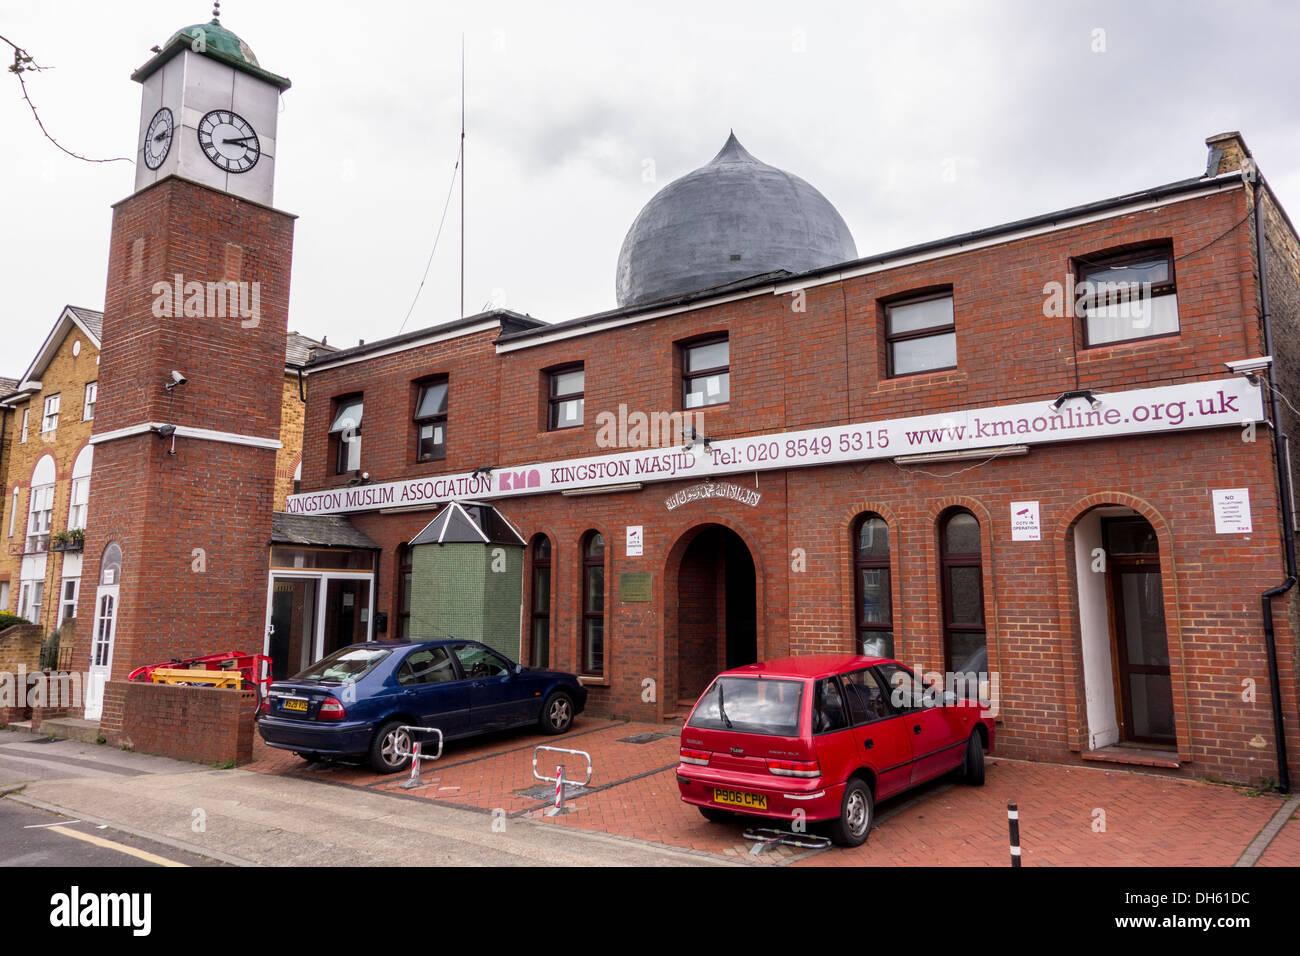 Kingston Muslim Association, Kingston upon Thames, London, UK - Stock Image